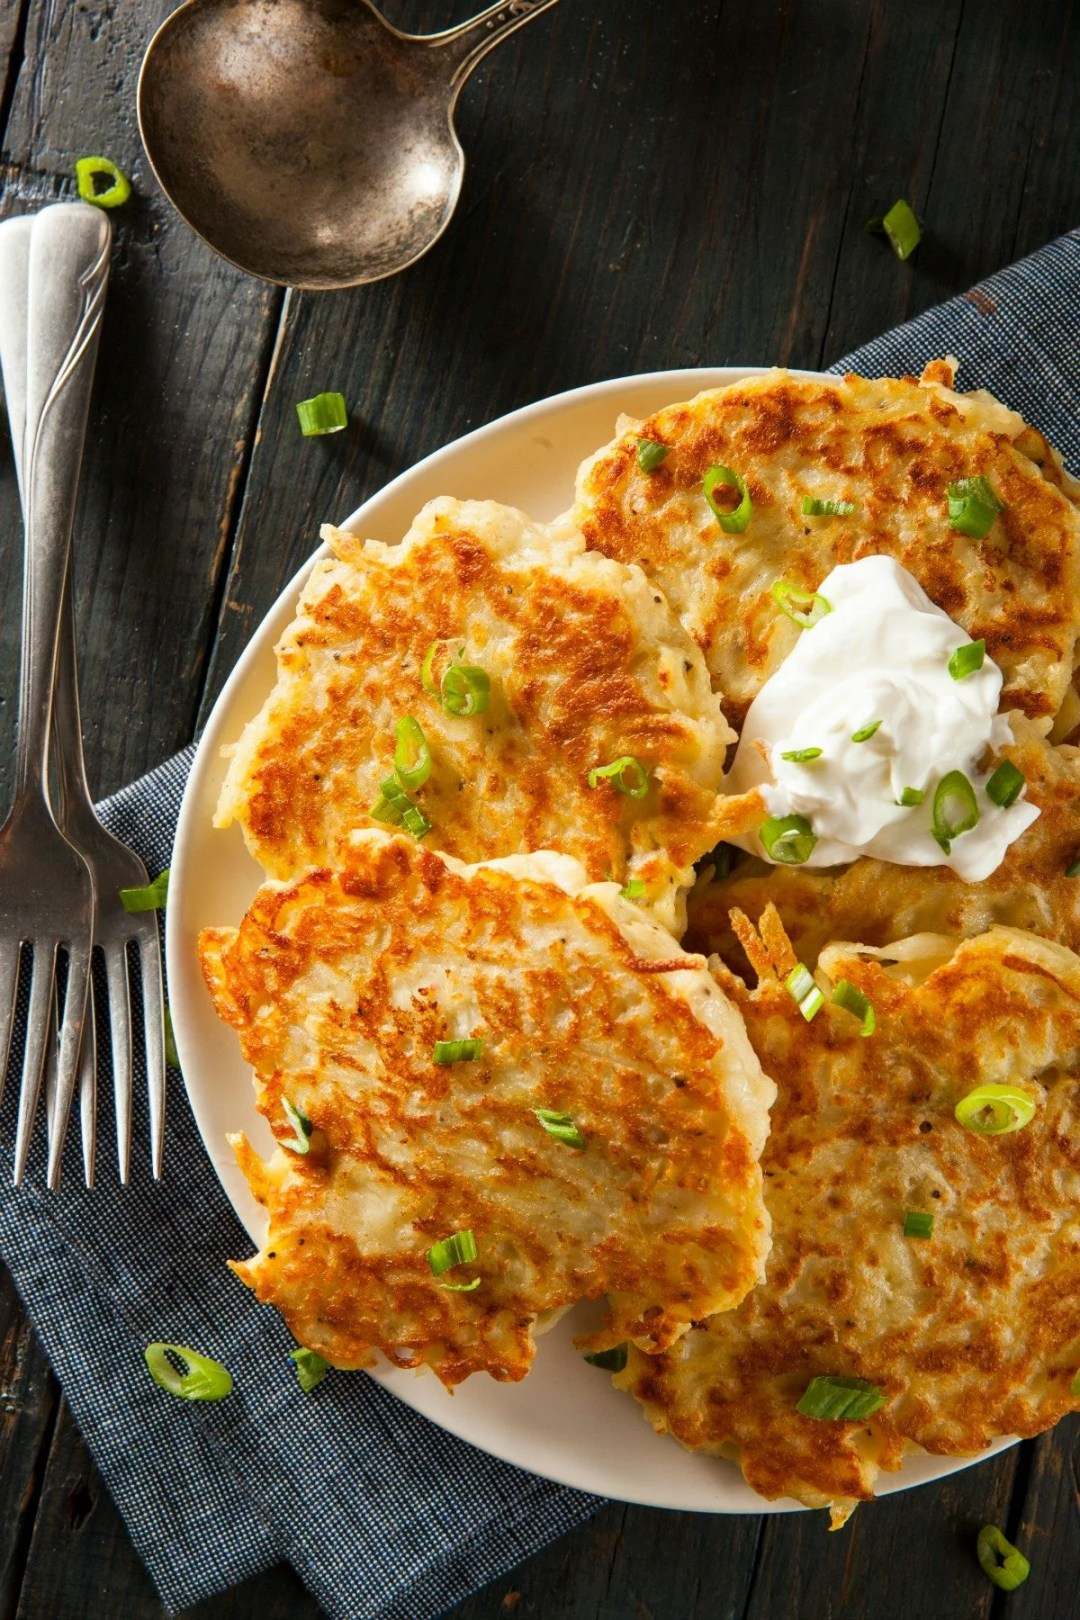 Traditional Irish Food - Homemade Boxty Irish Potato Pancakes for Breakfast